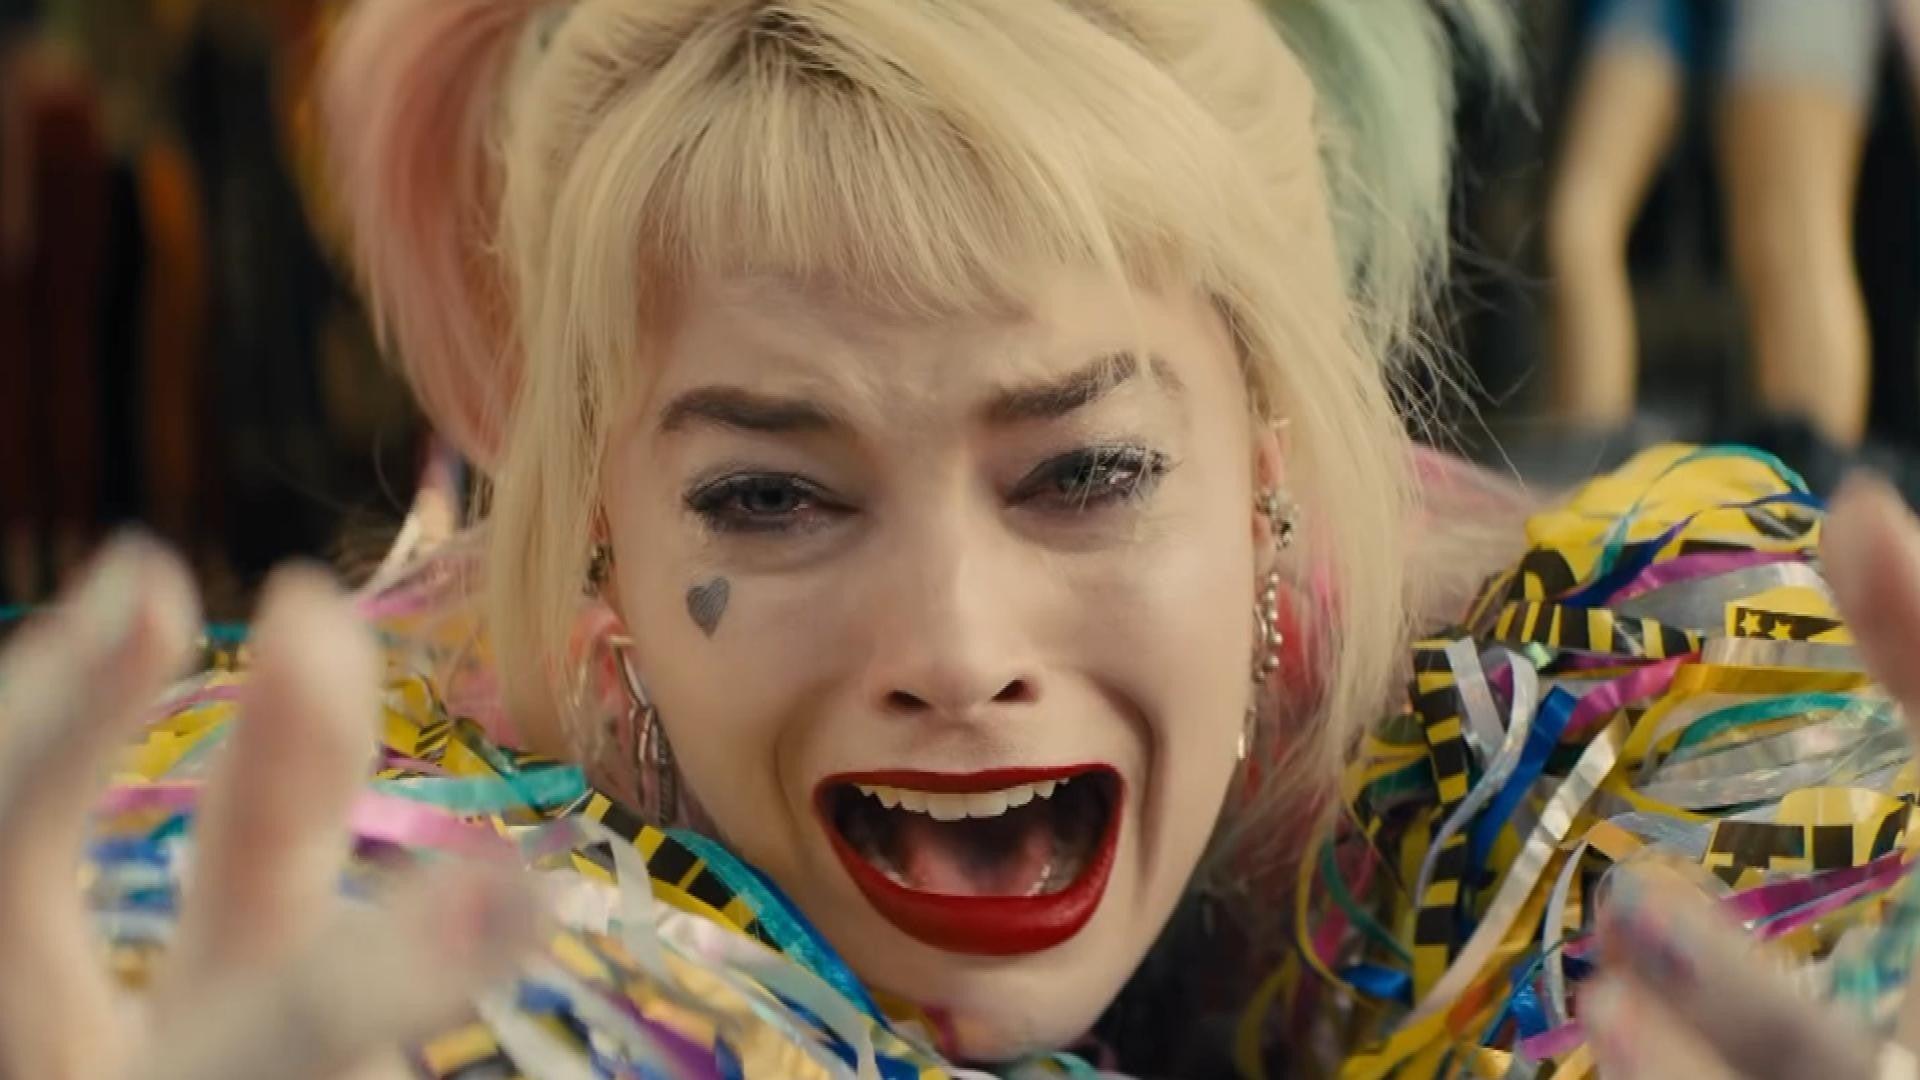 Birds of Prey, Harley Quinn, DC, Warner Bros., Box Office